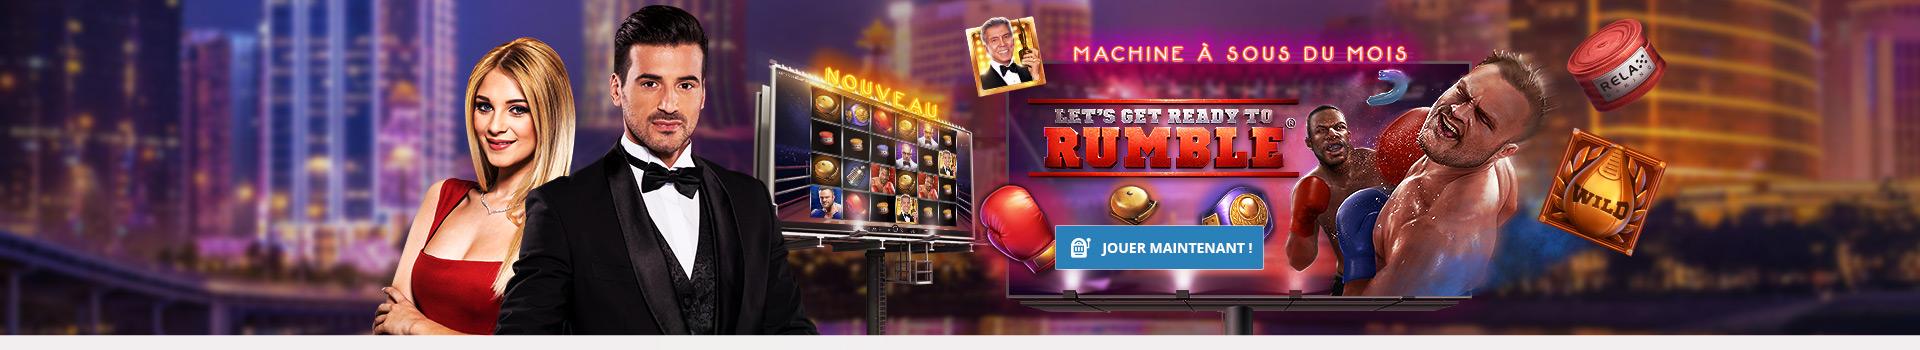 Machine à sous Let's Get Ready to Rumble par Relax Gaming